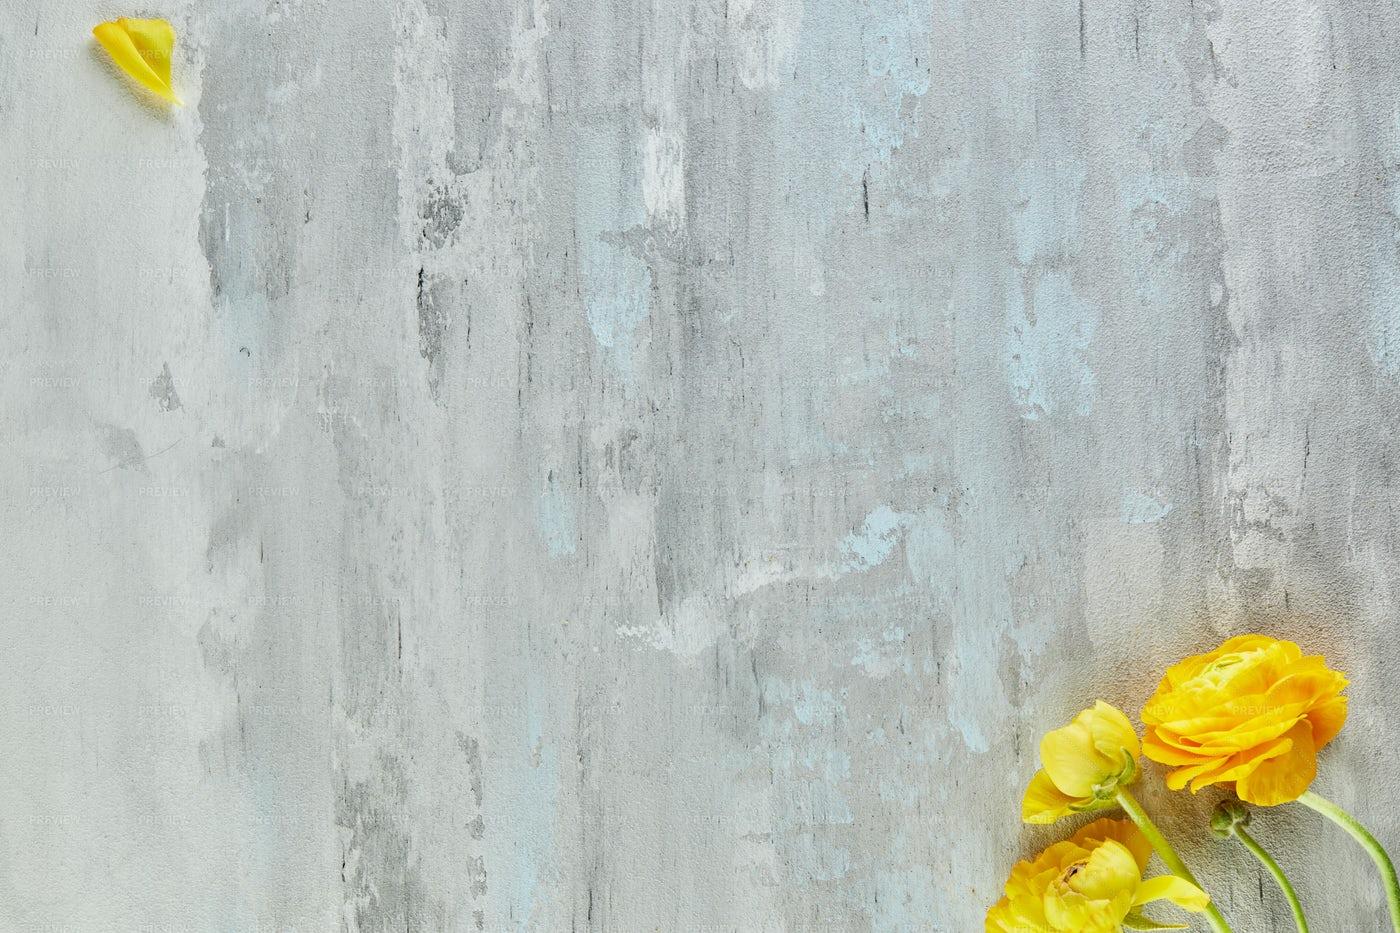 Yellow Flower On Grey: Stock Photos